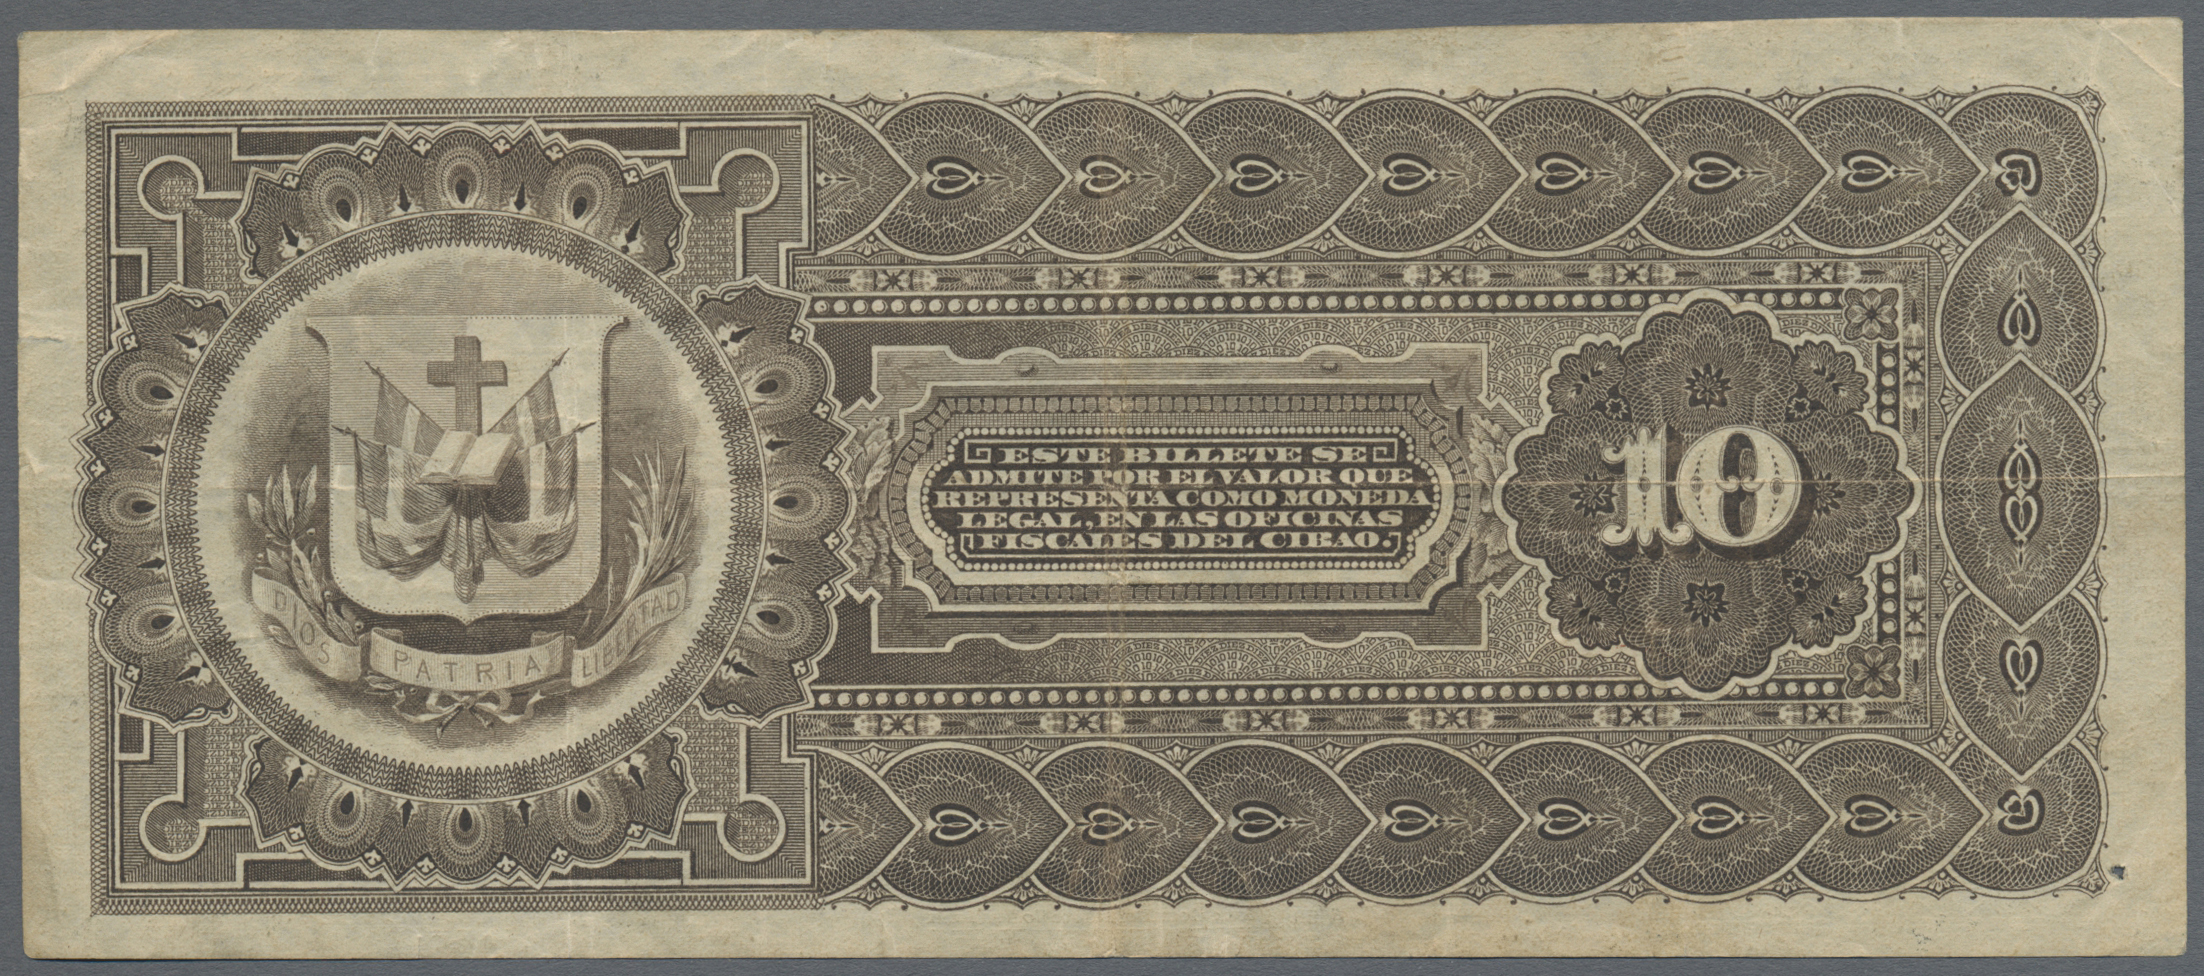 Lot 8355 - Dominican Republic / Dominikanische Republik banknoten -  Auktionshaus Christoph Gärtner GmbH & Co. KG Sale #47 Banknotes Worldwide & Germany, Numismatics